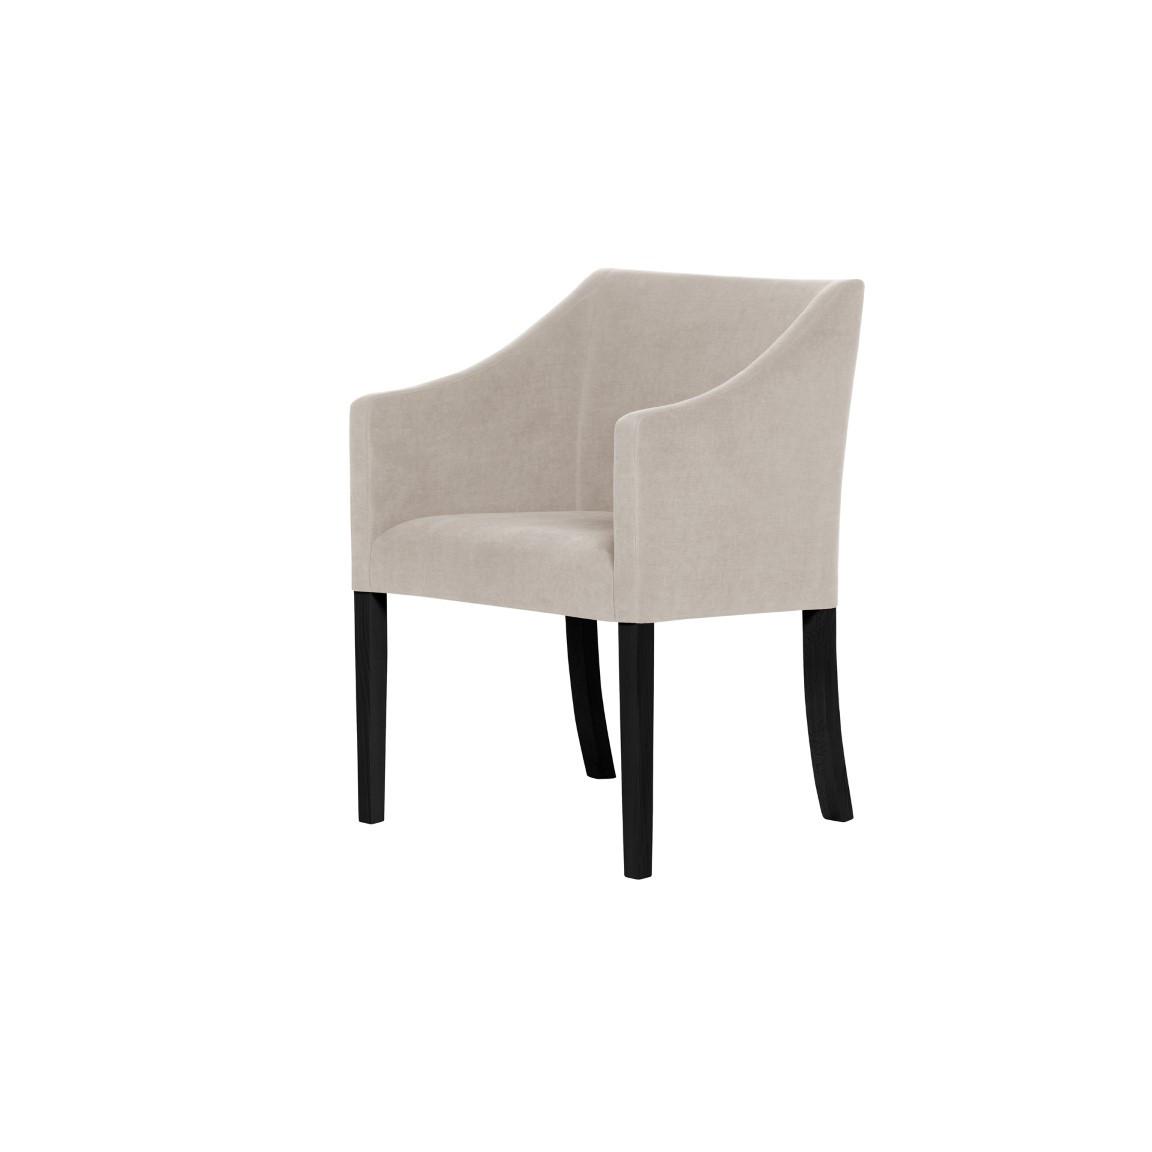 Chaise à Manger Illusion | Blanc